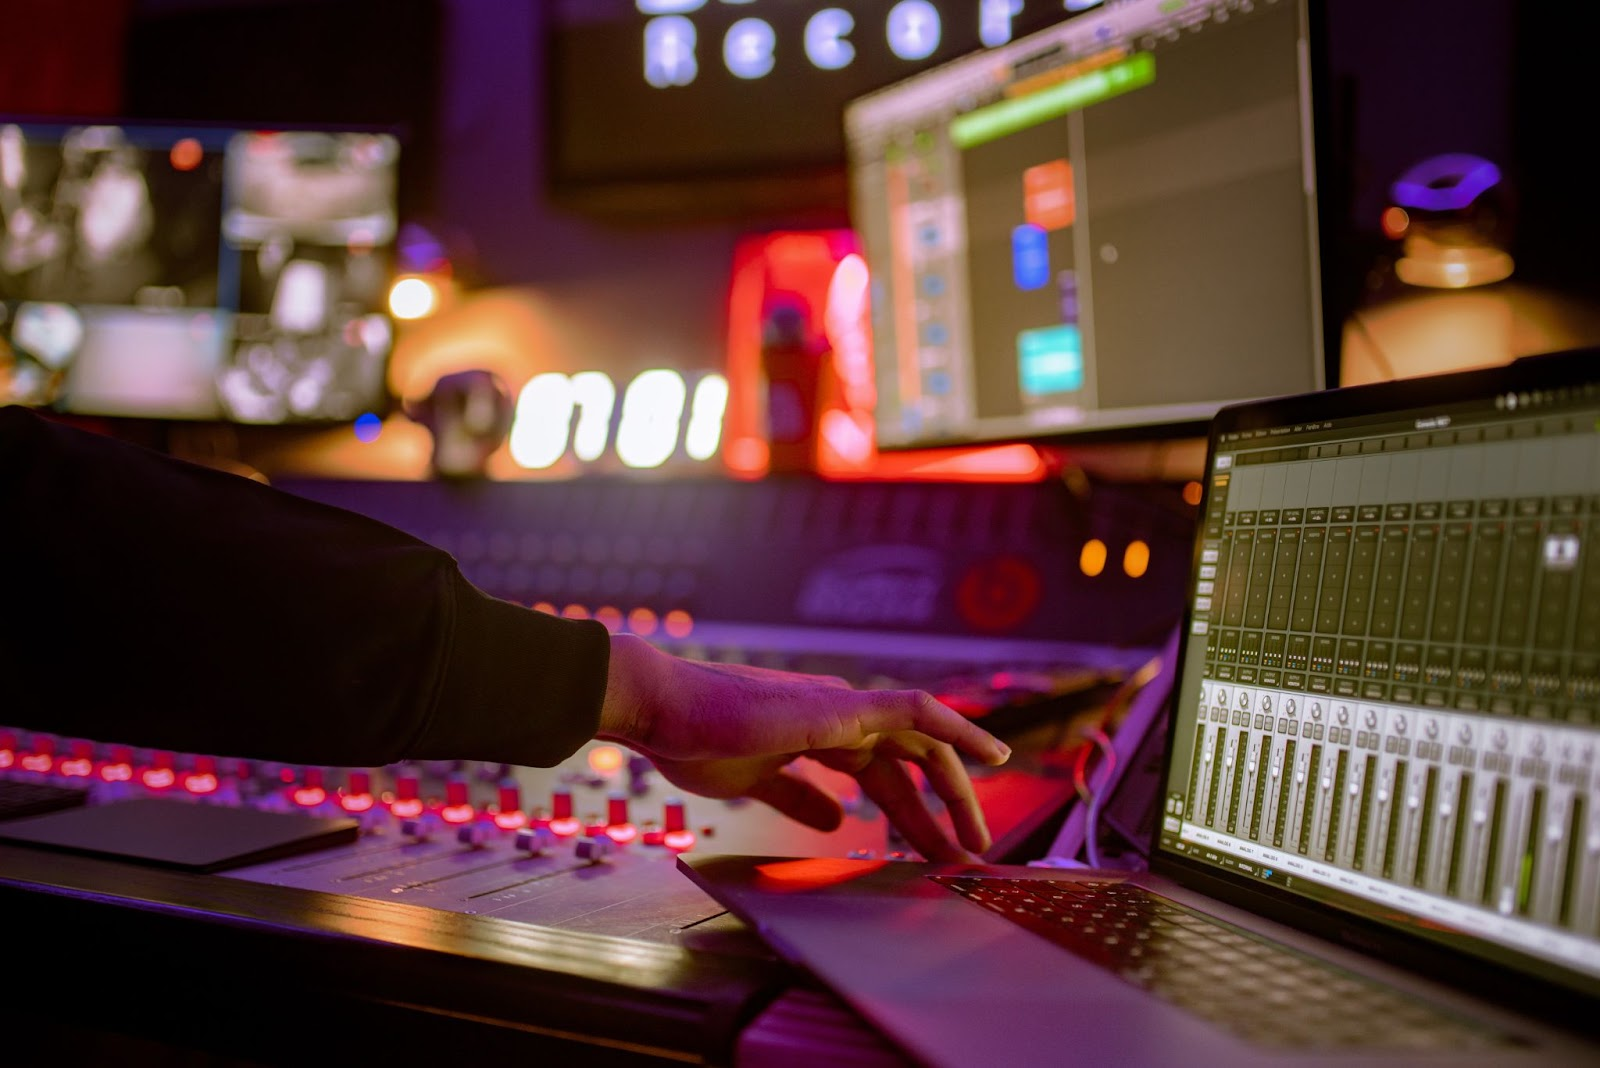 Individual using soundboard and computer to make music